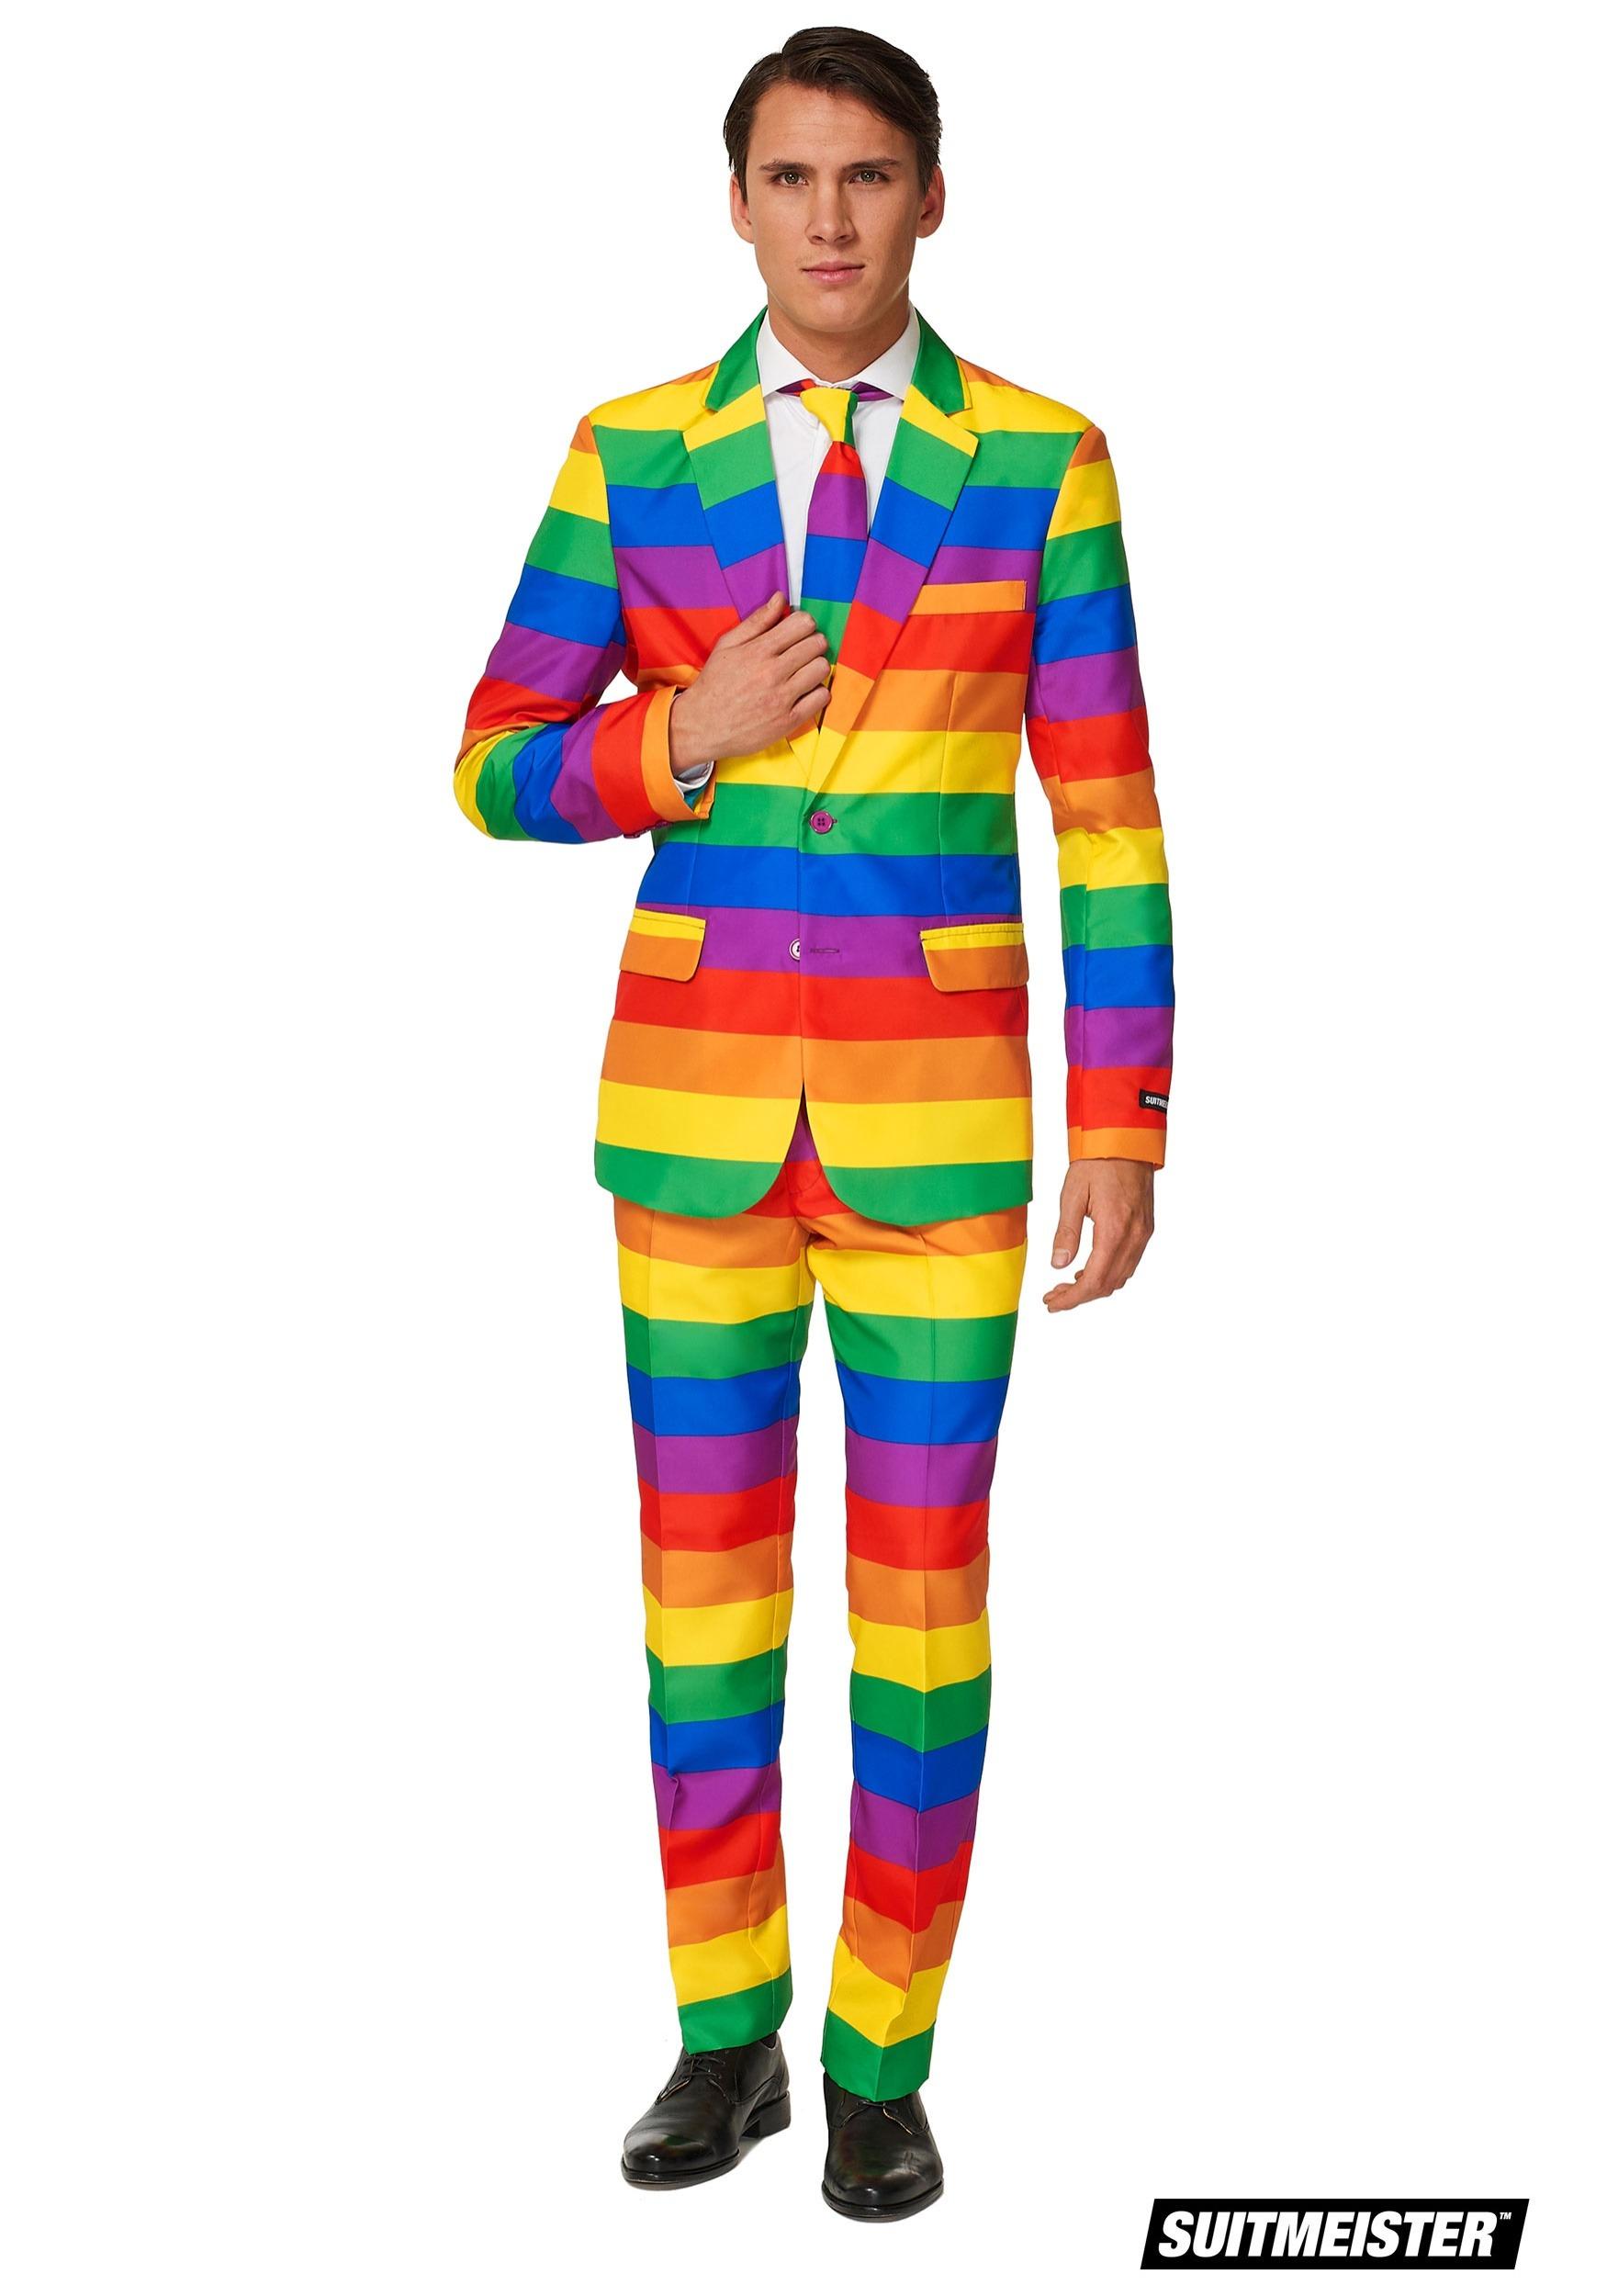 Suitmeister Men S Rainbow Suit Costume